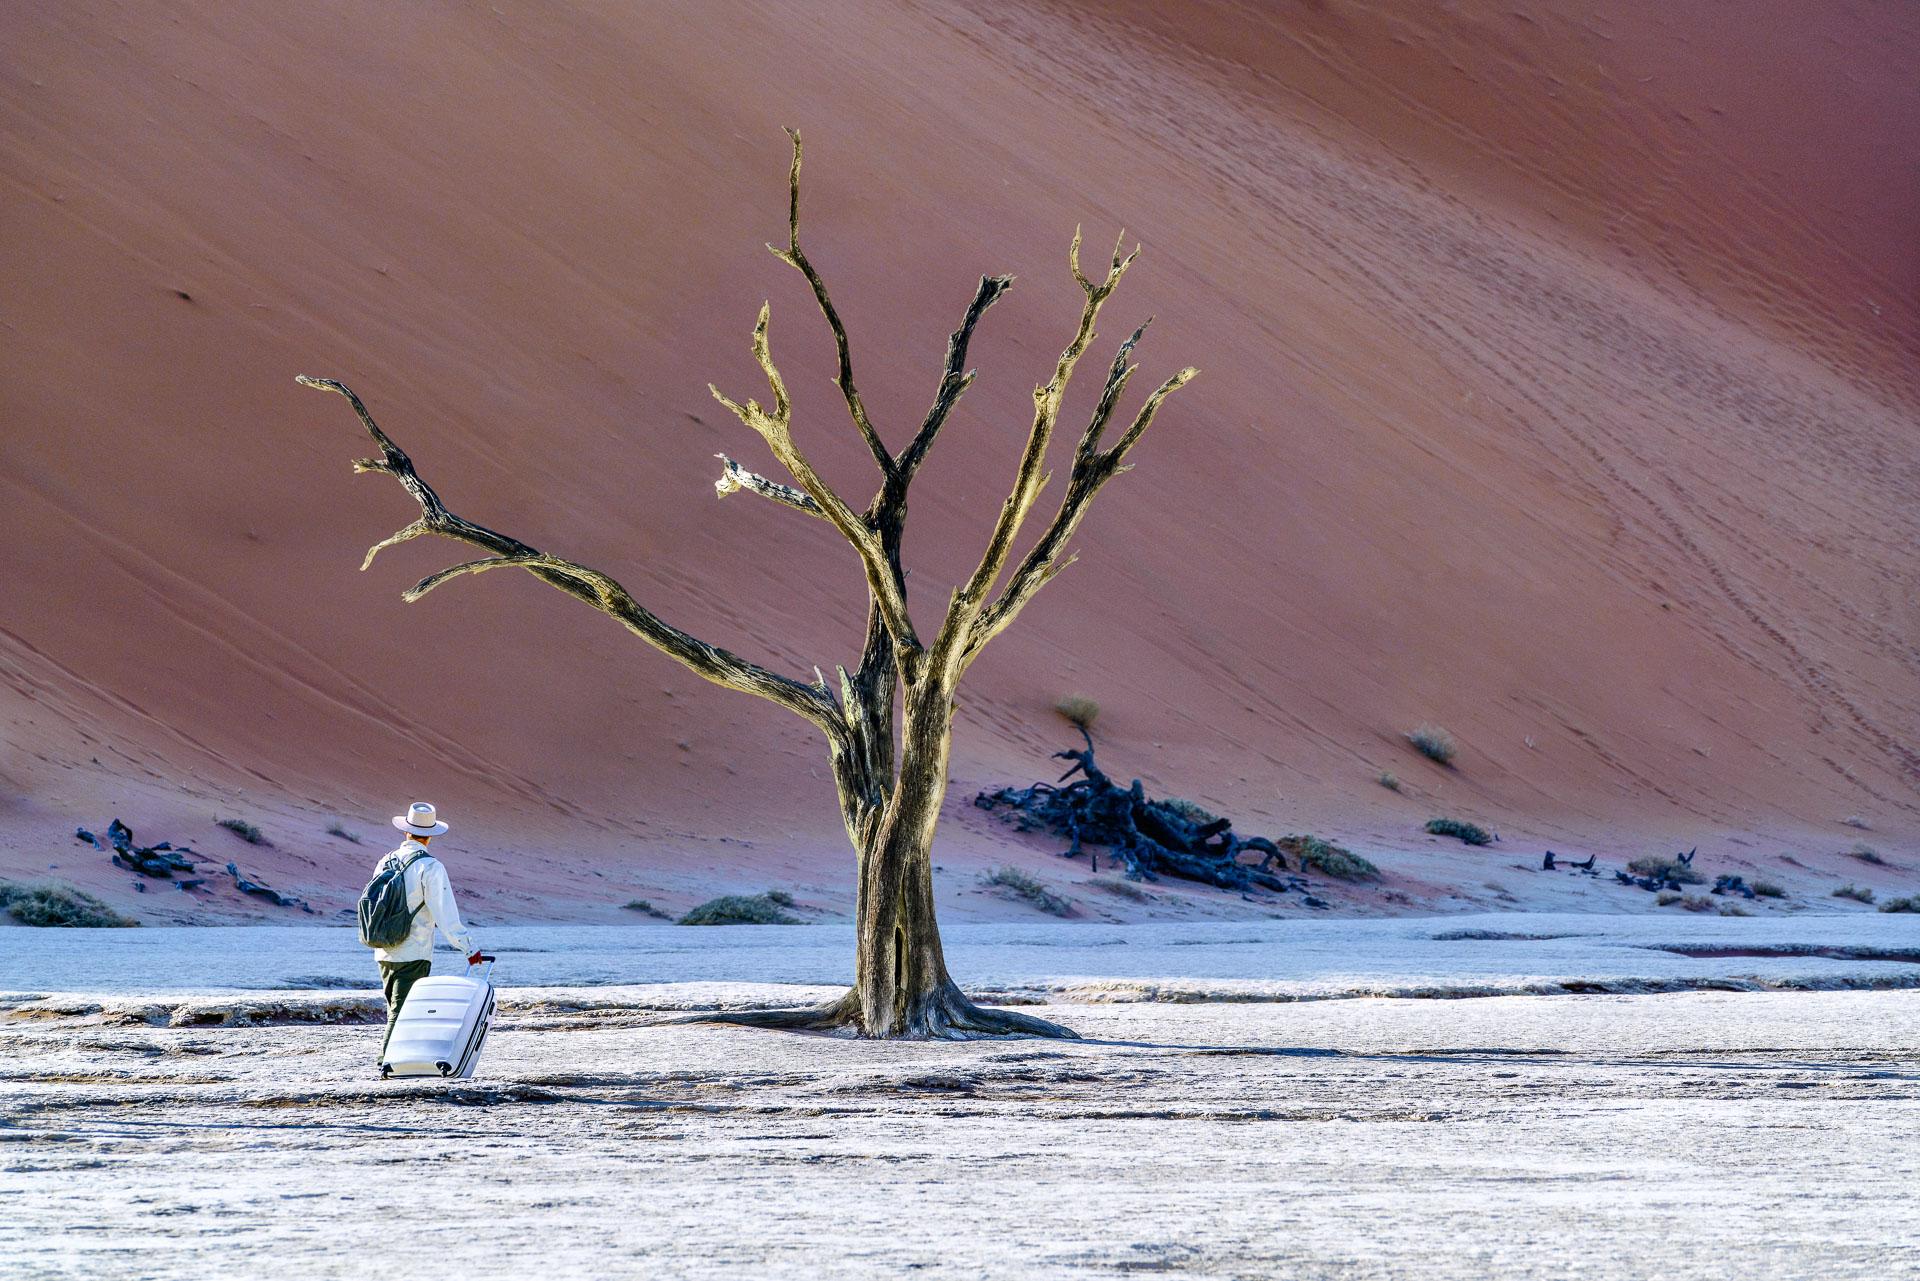 fotoreise-fotosafari-hd-2021-018-Namibia